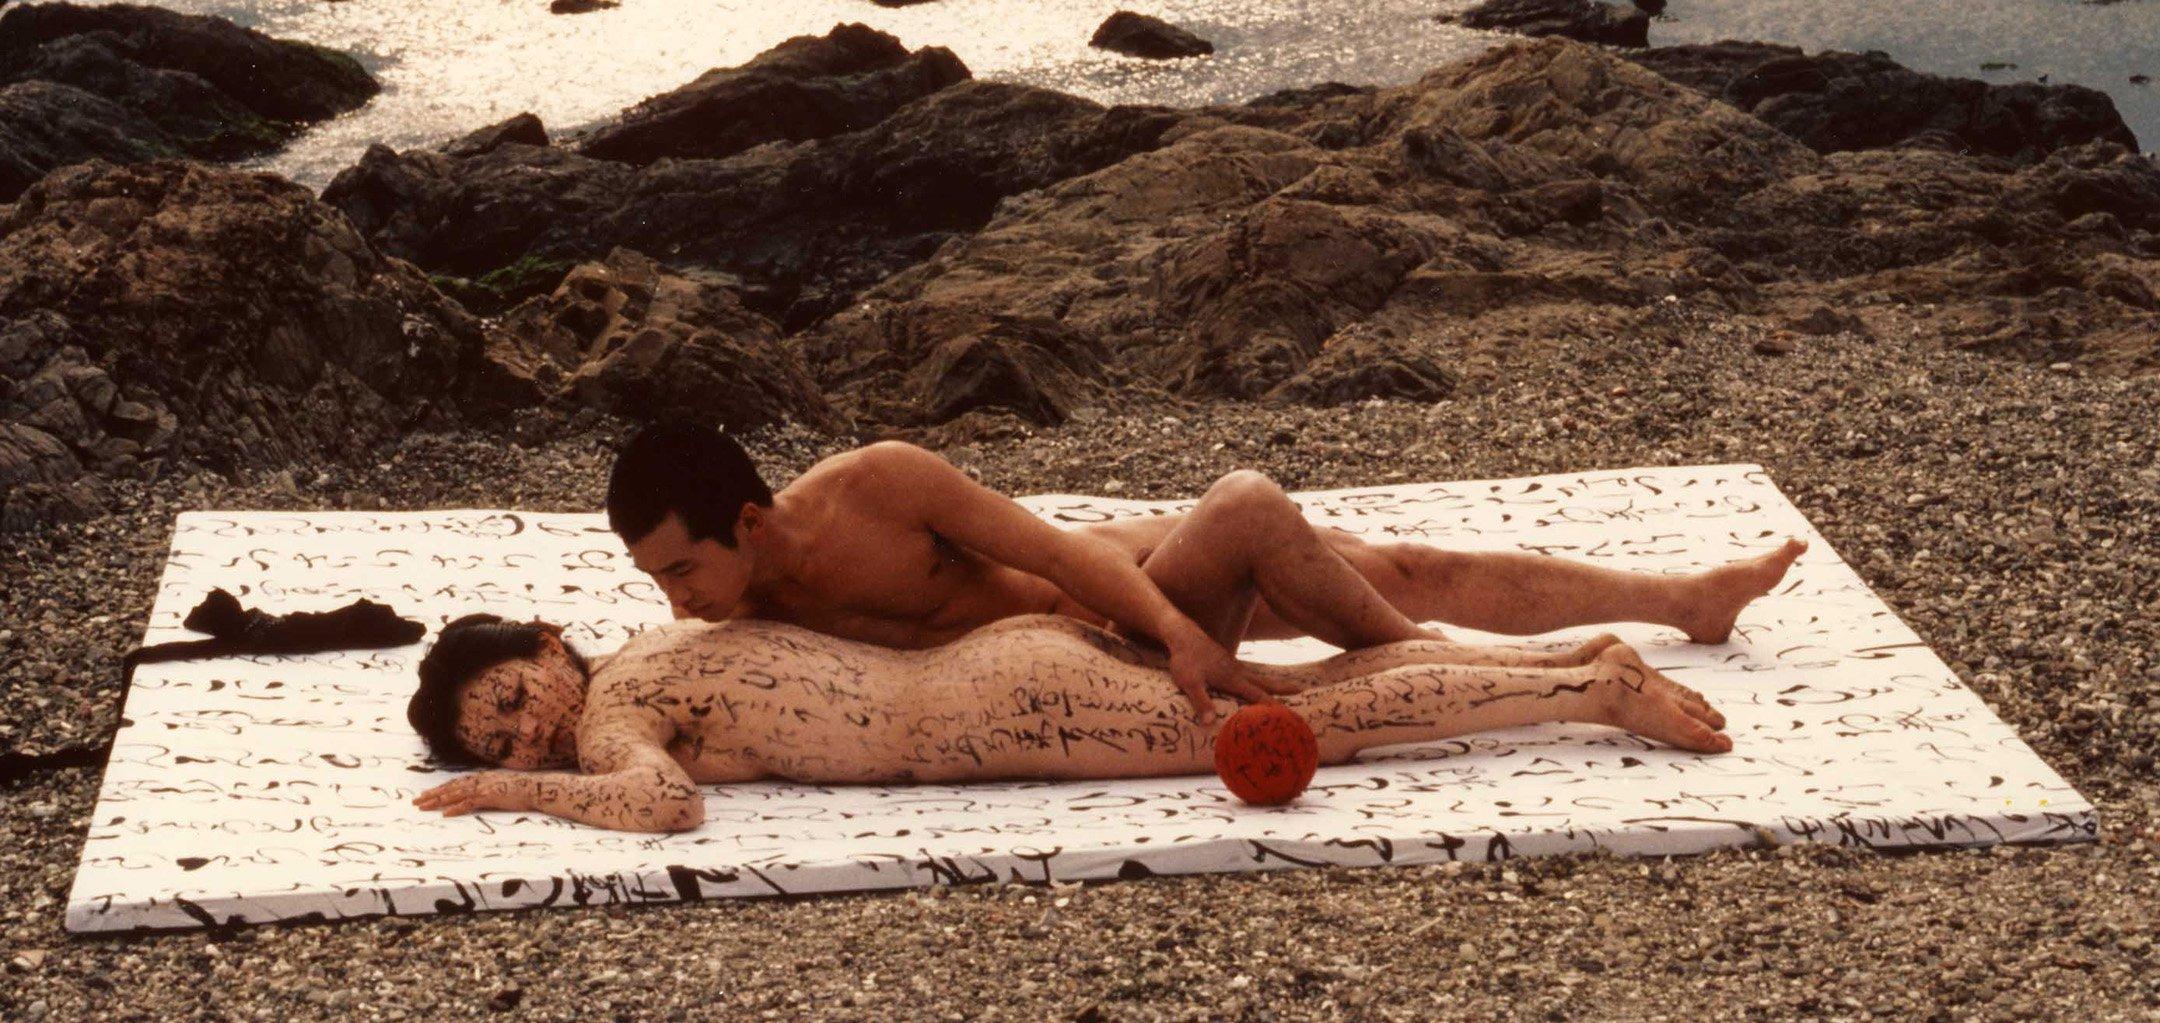 Still from 'Grass Labyrinth' (1979)